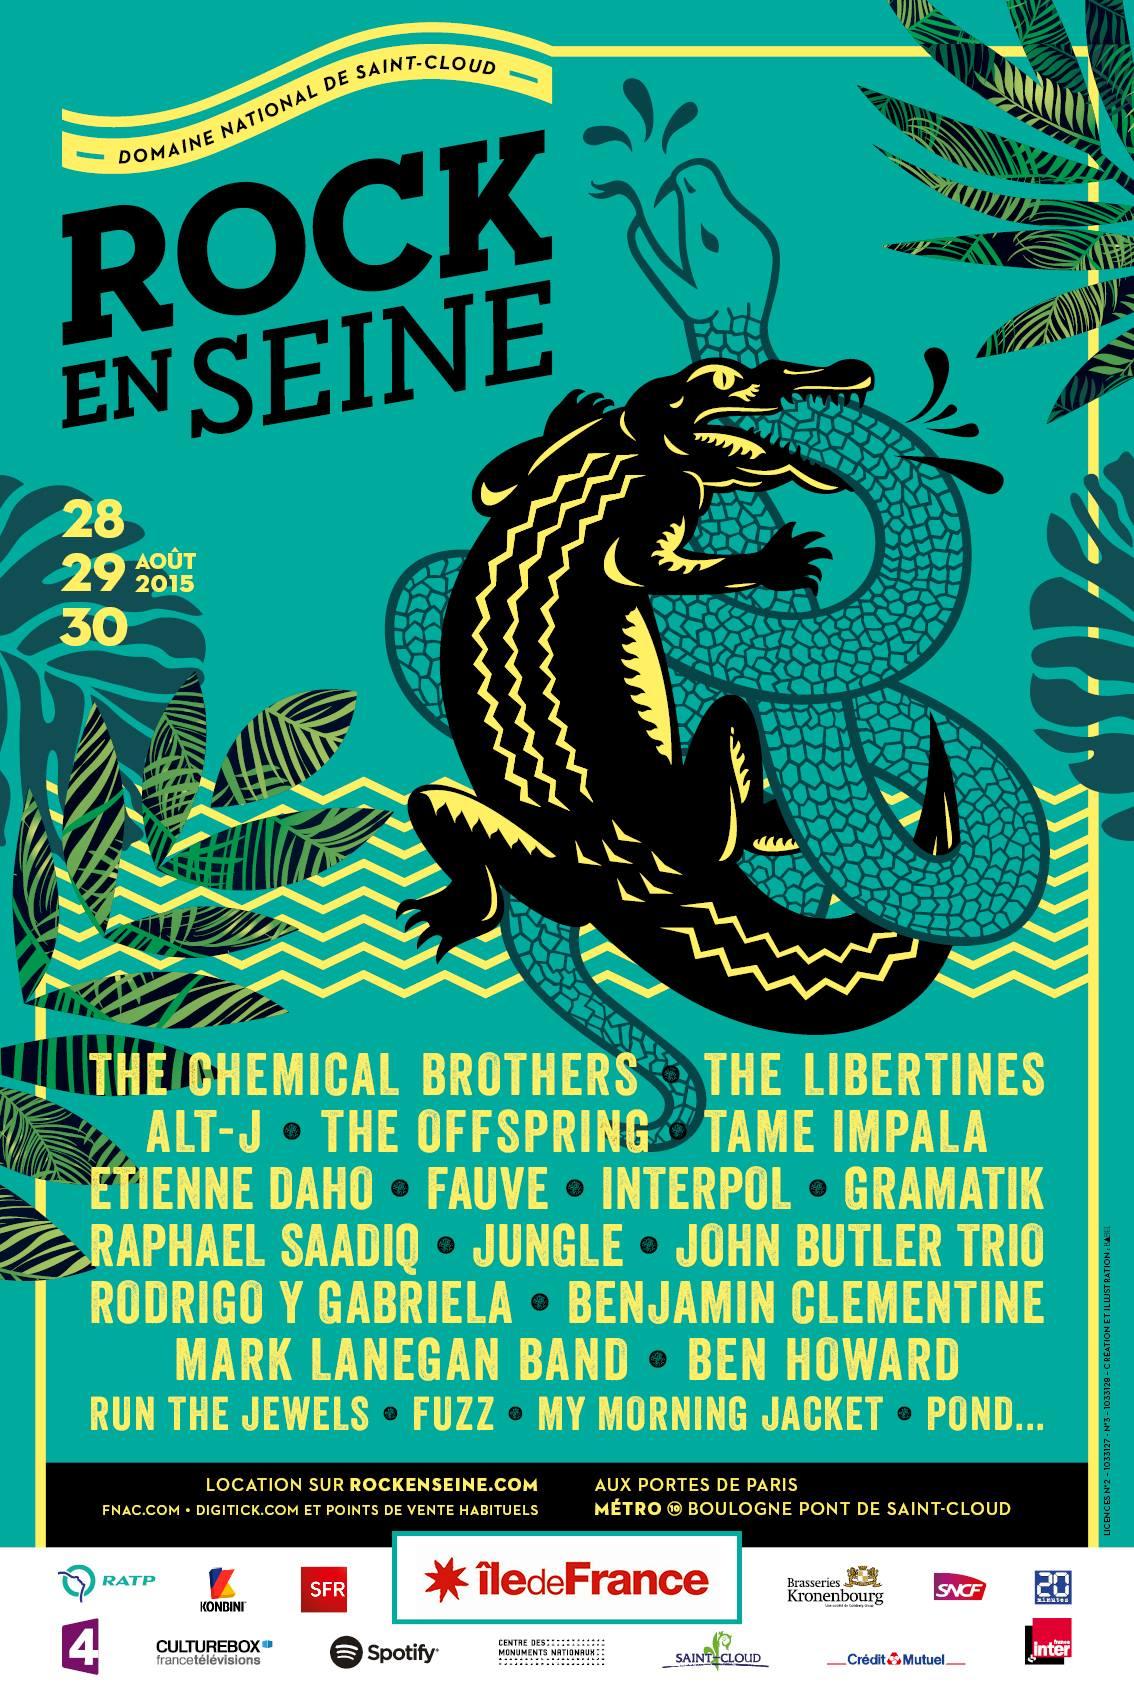 rock-en-seine-affiche-2015-folkr